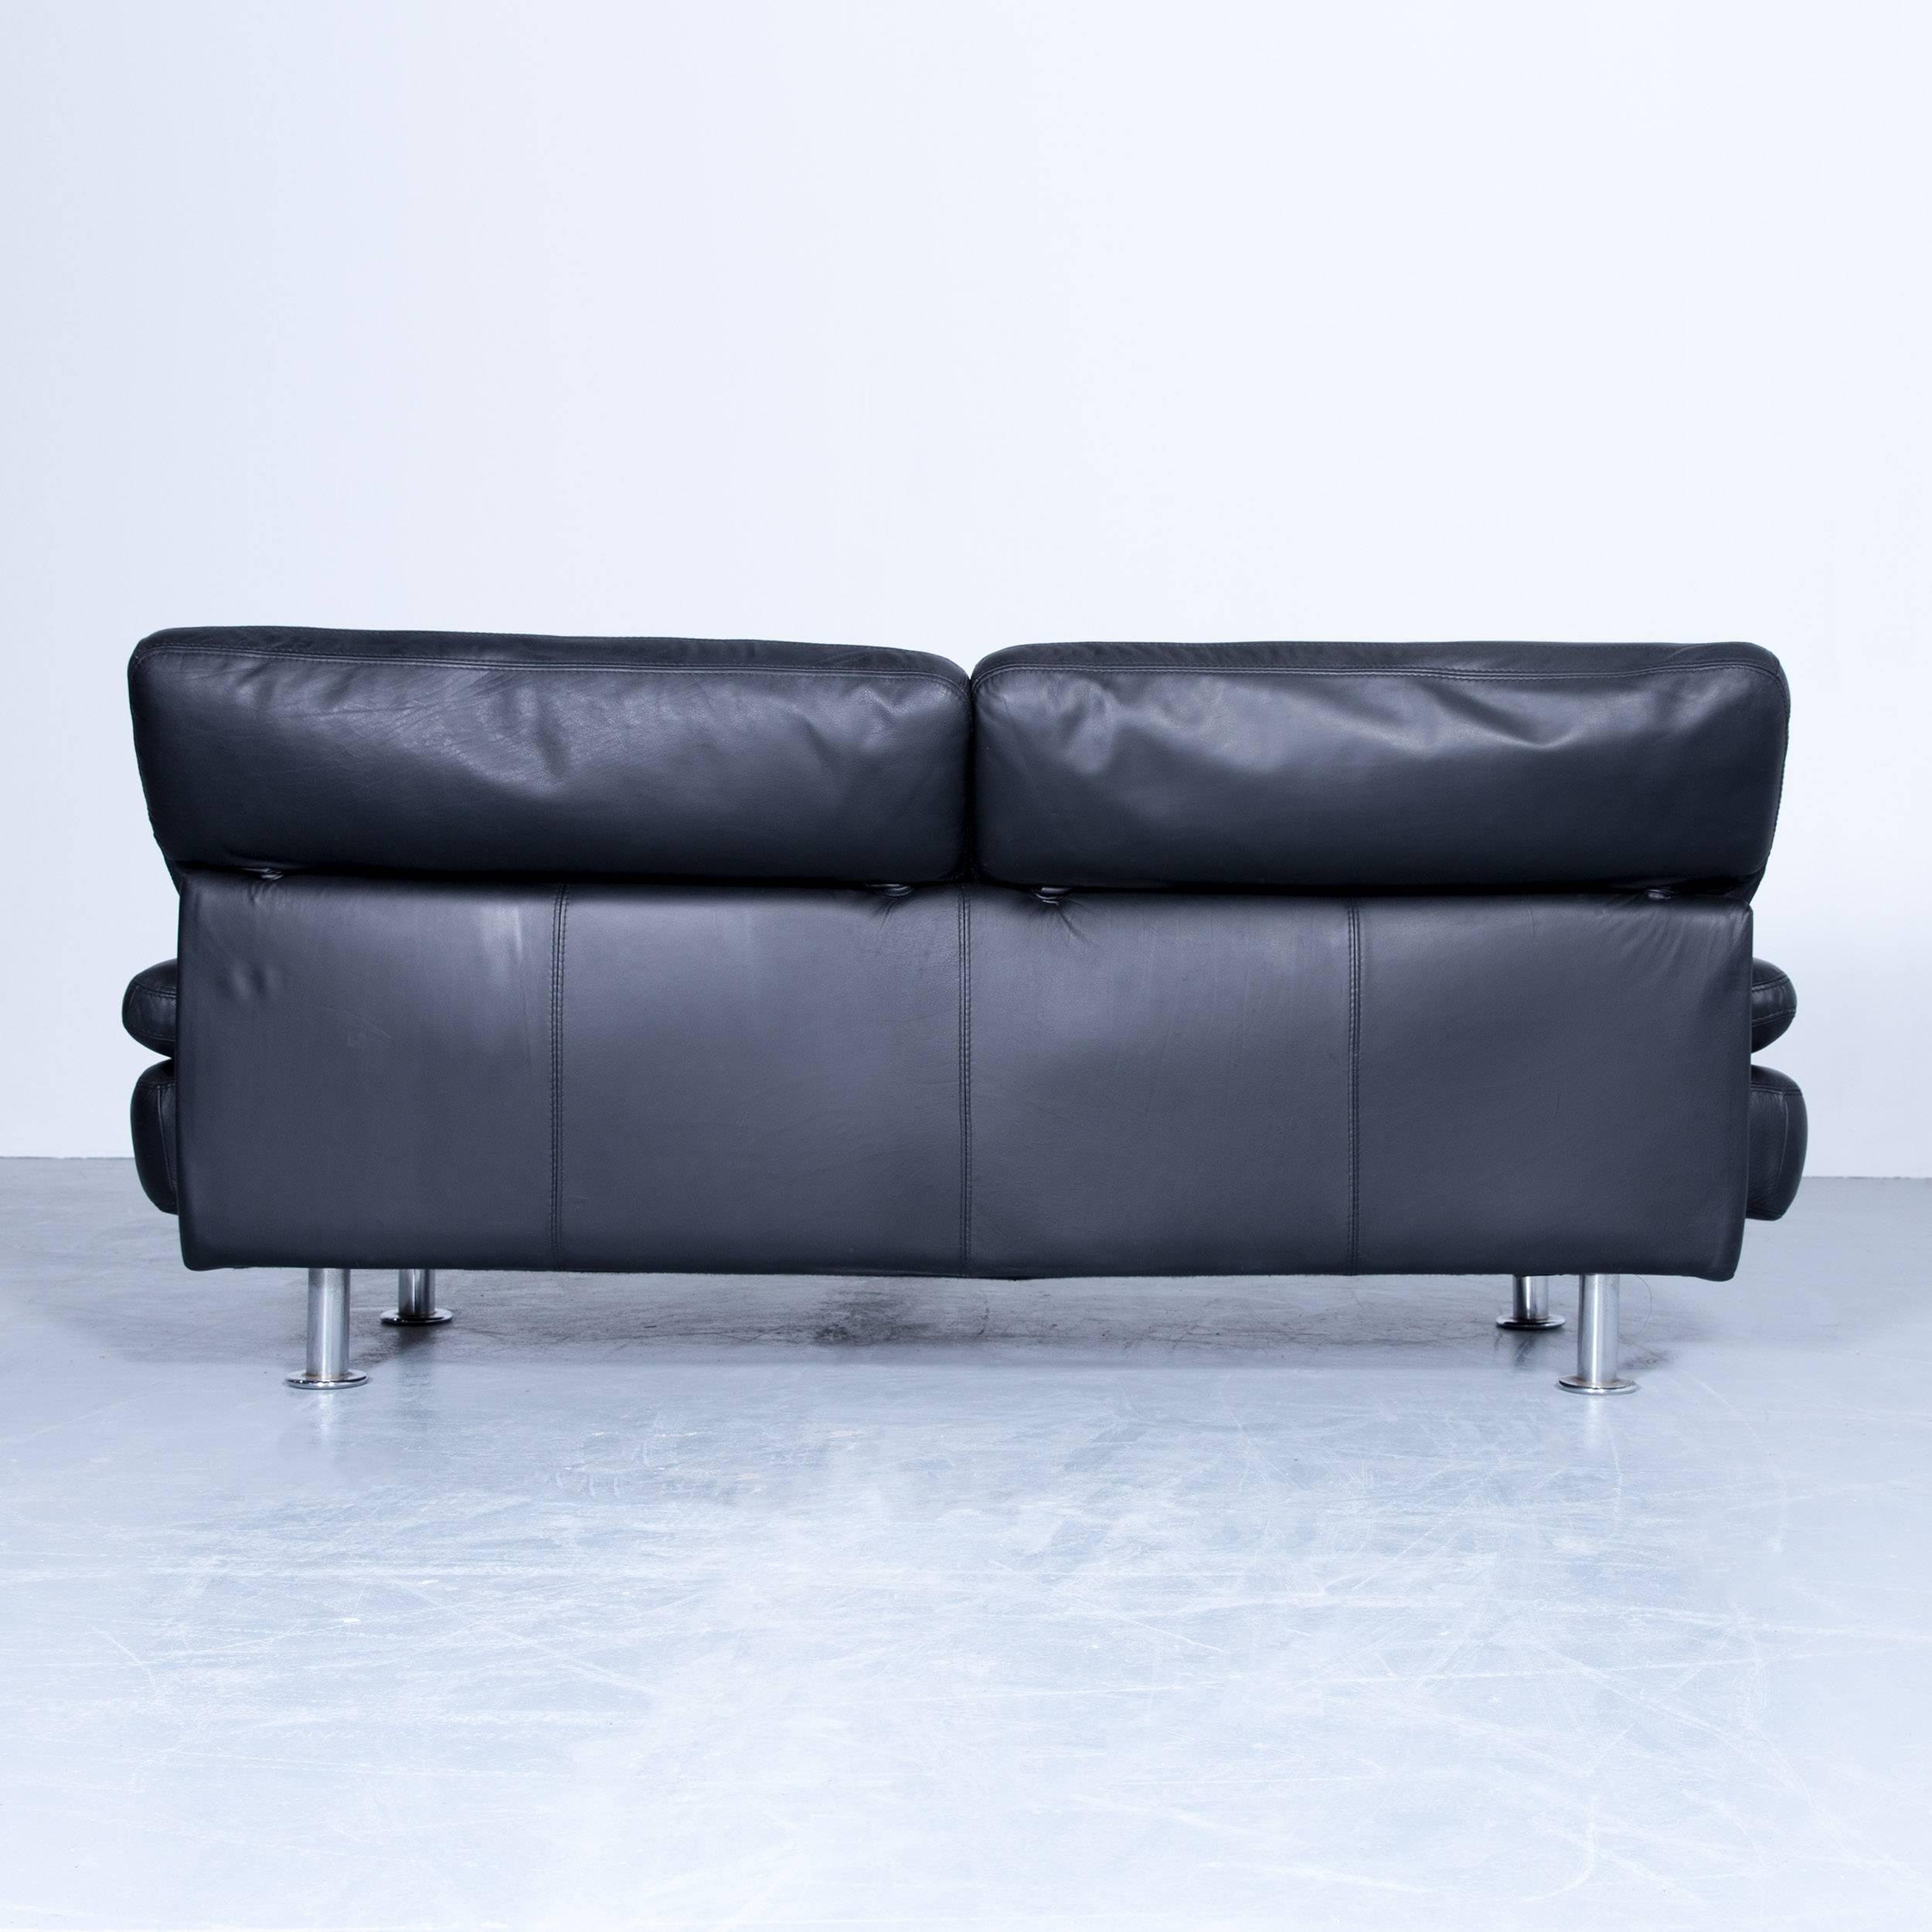 Designer Sofa Occasion Transforming With Multifunctional Furniture